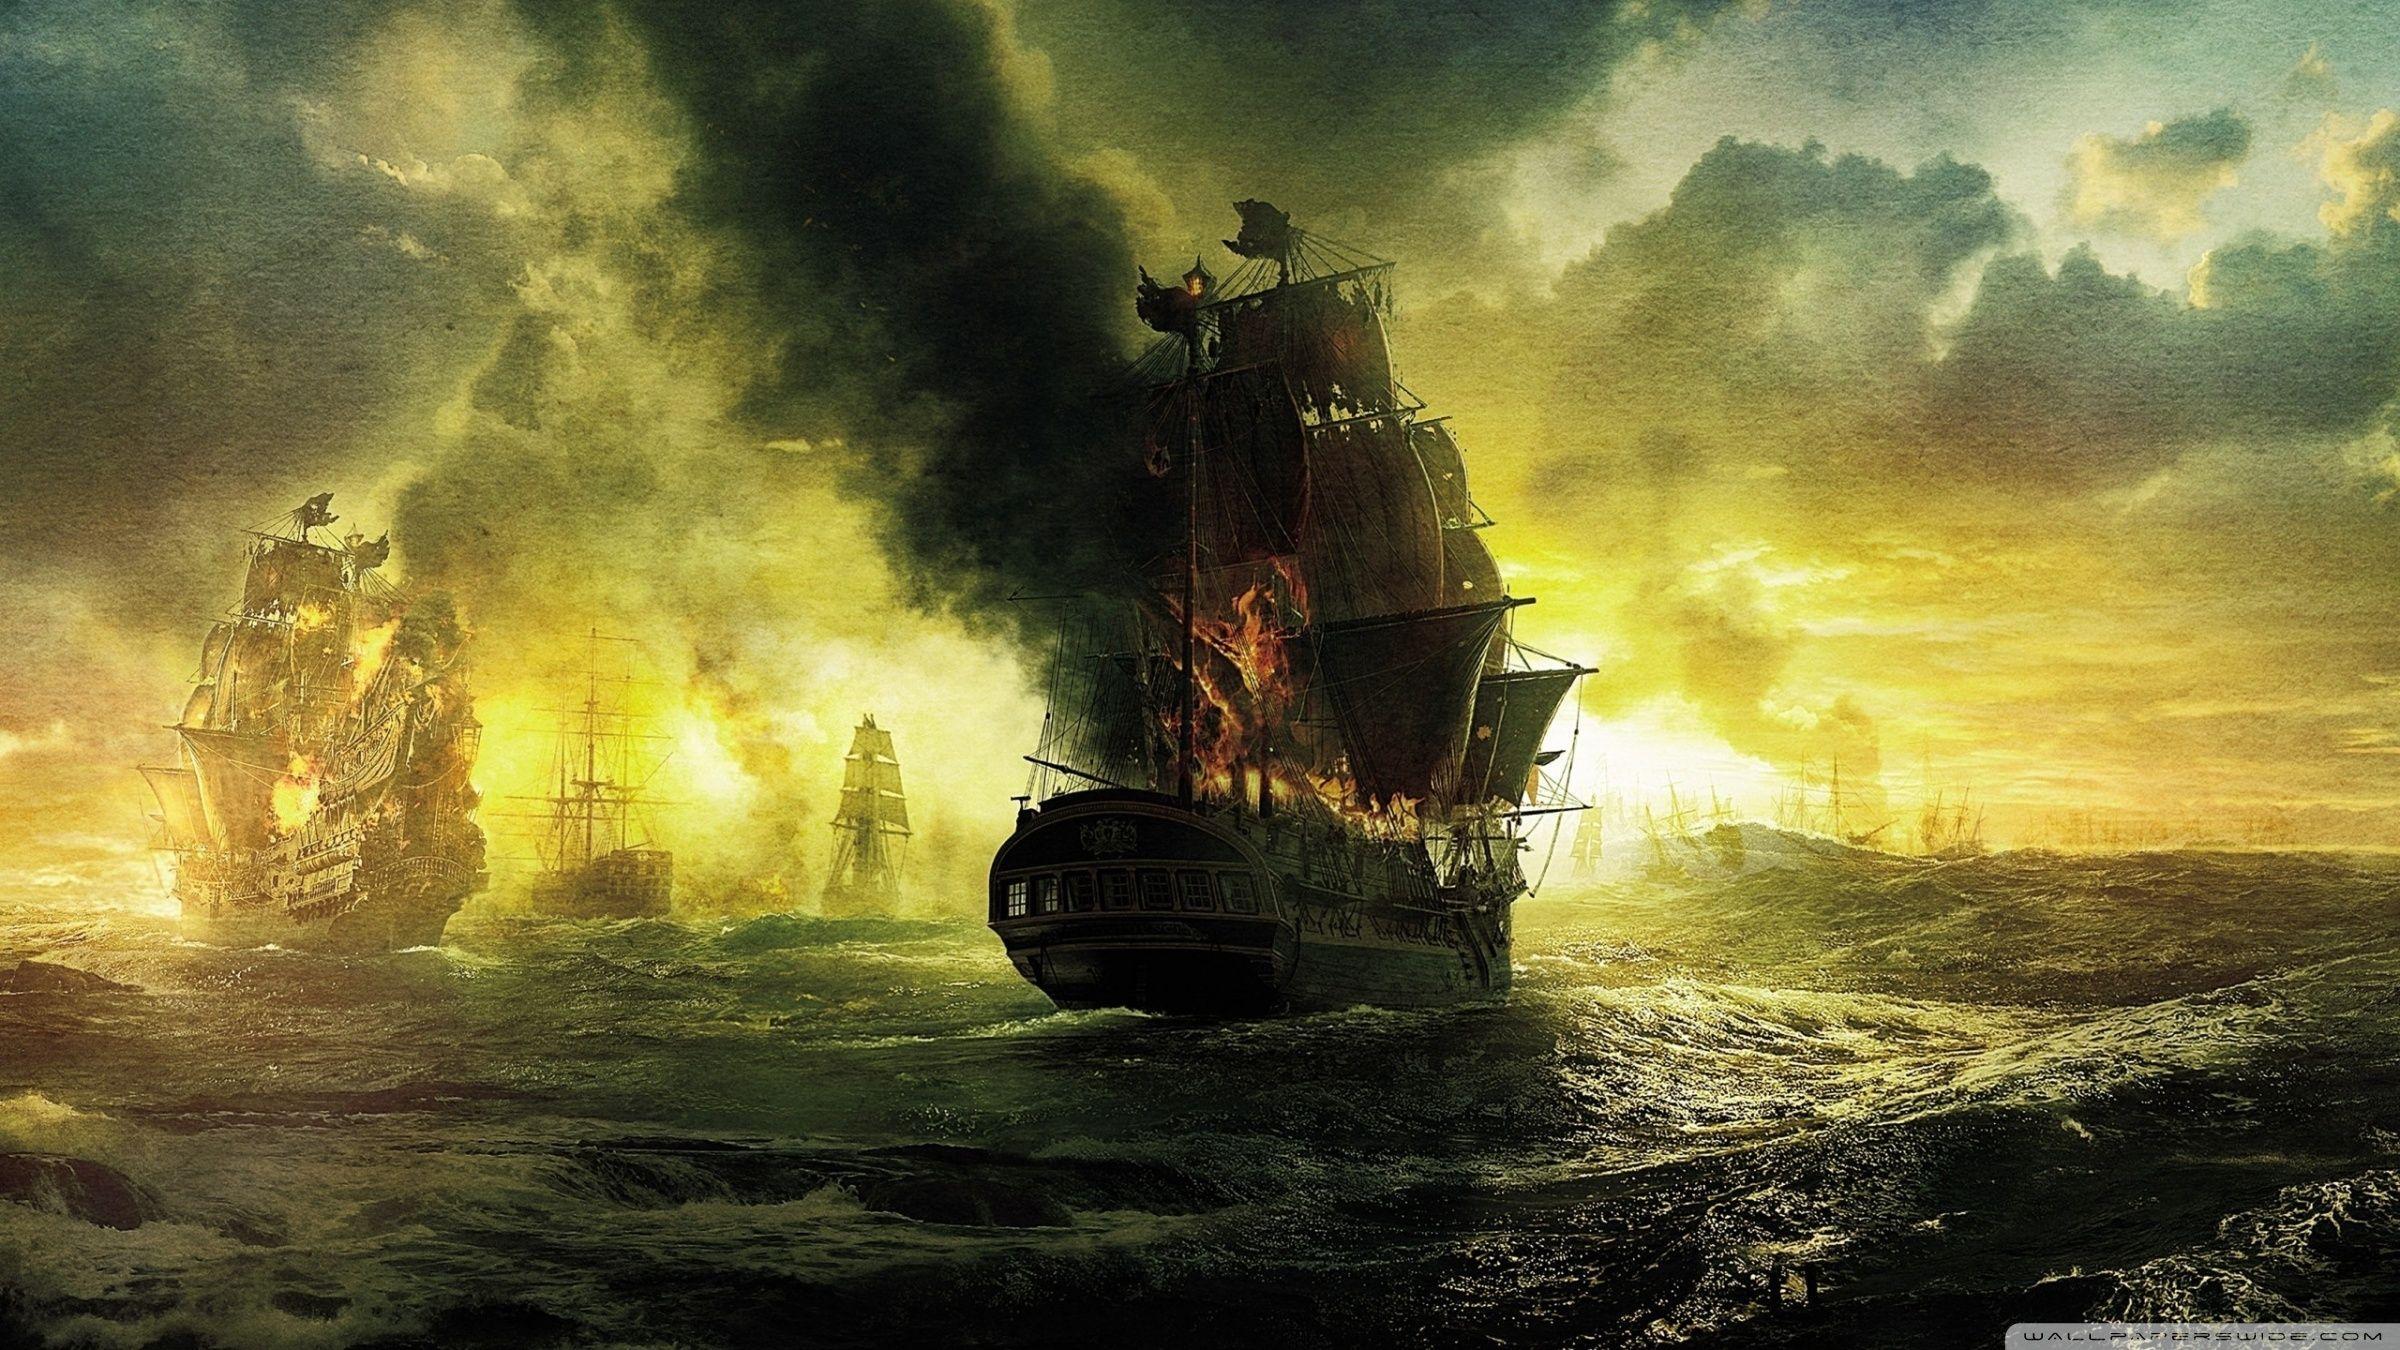 2011 Pirates Of The Caribbean On Stranger Tides HD desktop ...